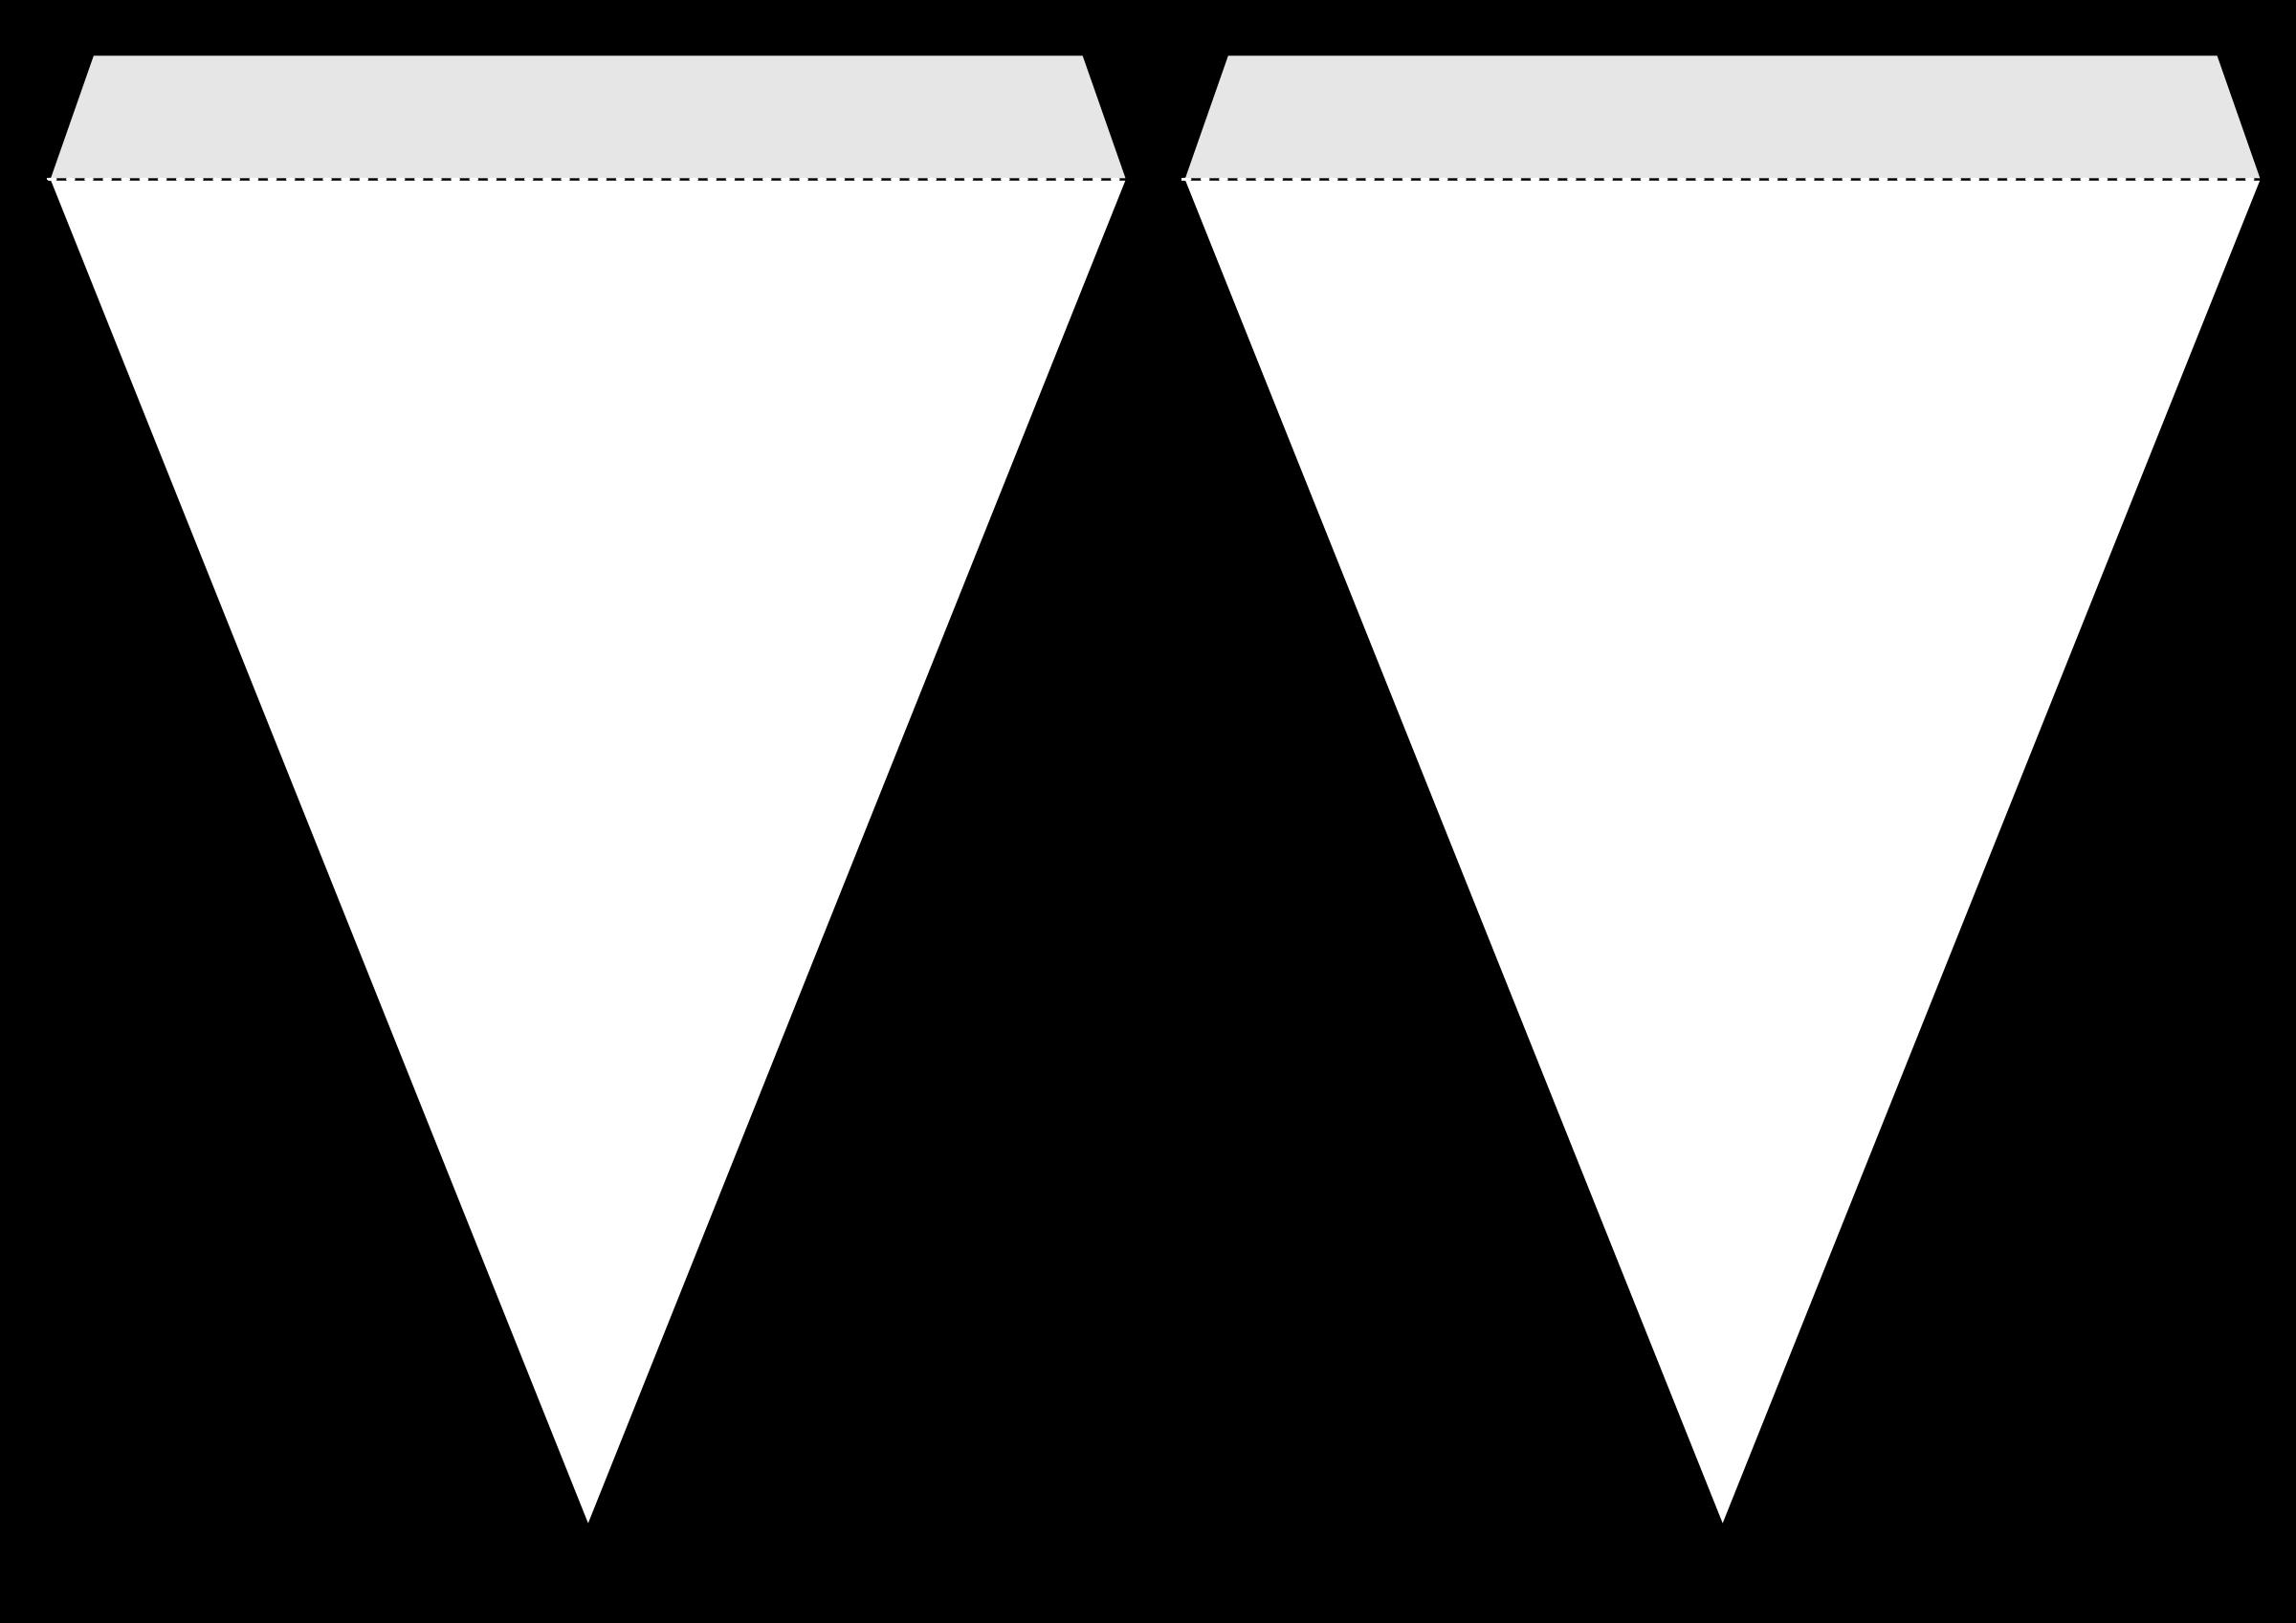 Triangle banner template big. Triangular clipart pennant